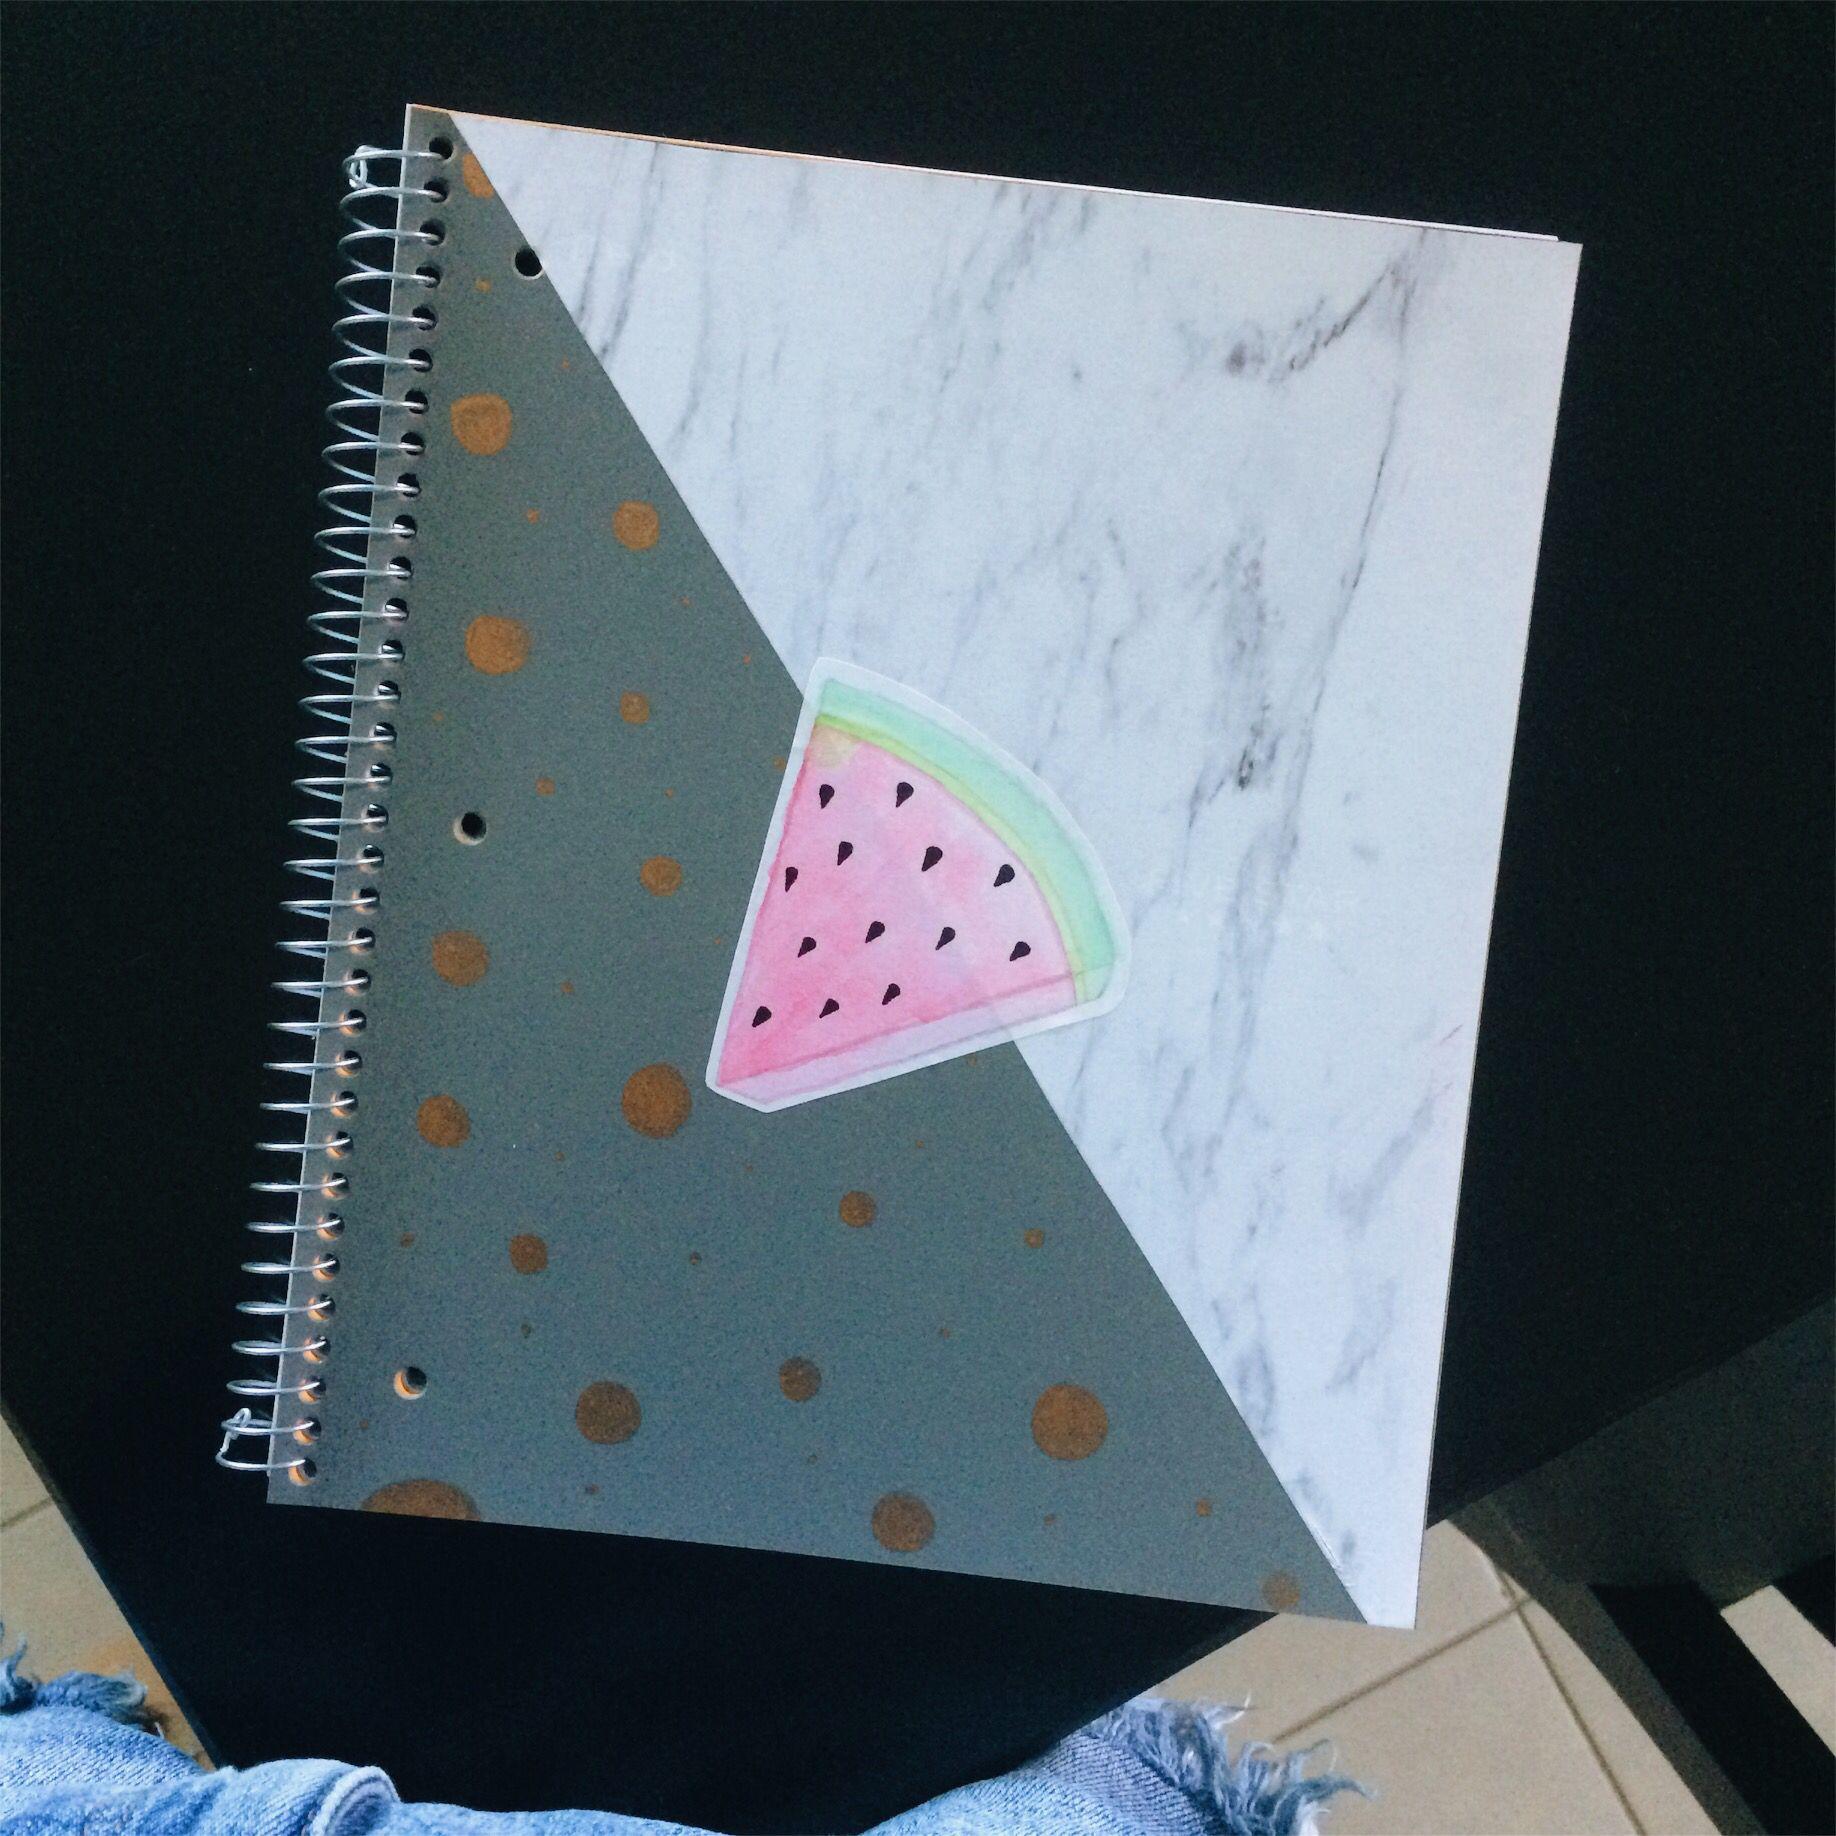 DIY Tumblr notebook 🏼 | Bts-DIY | Pinterest